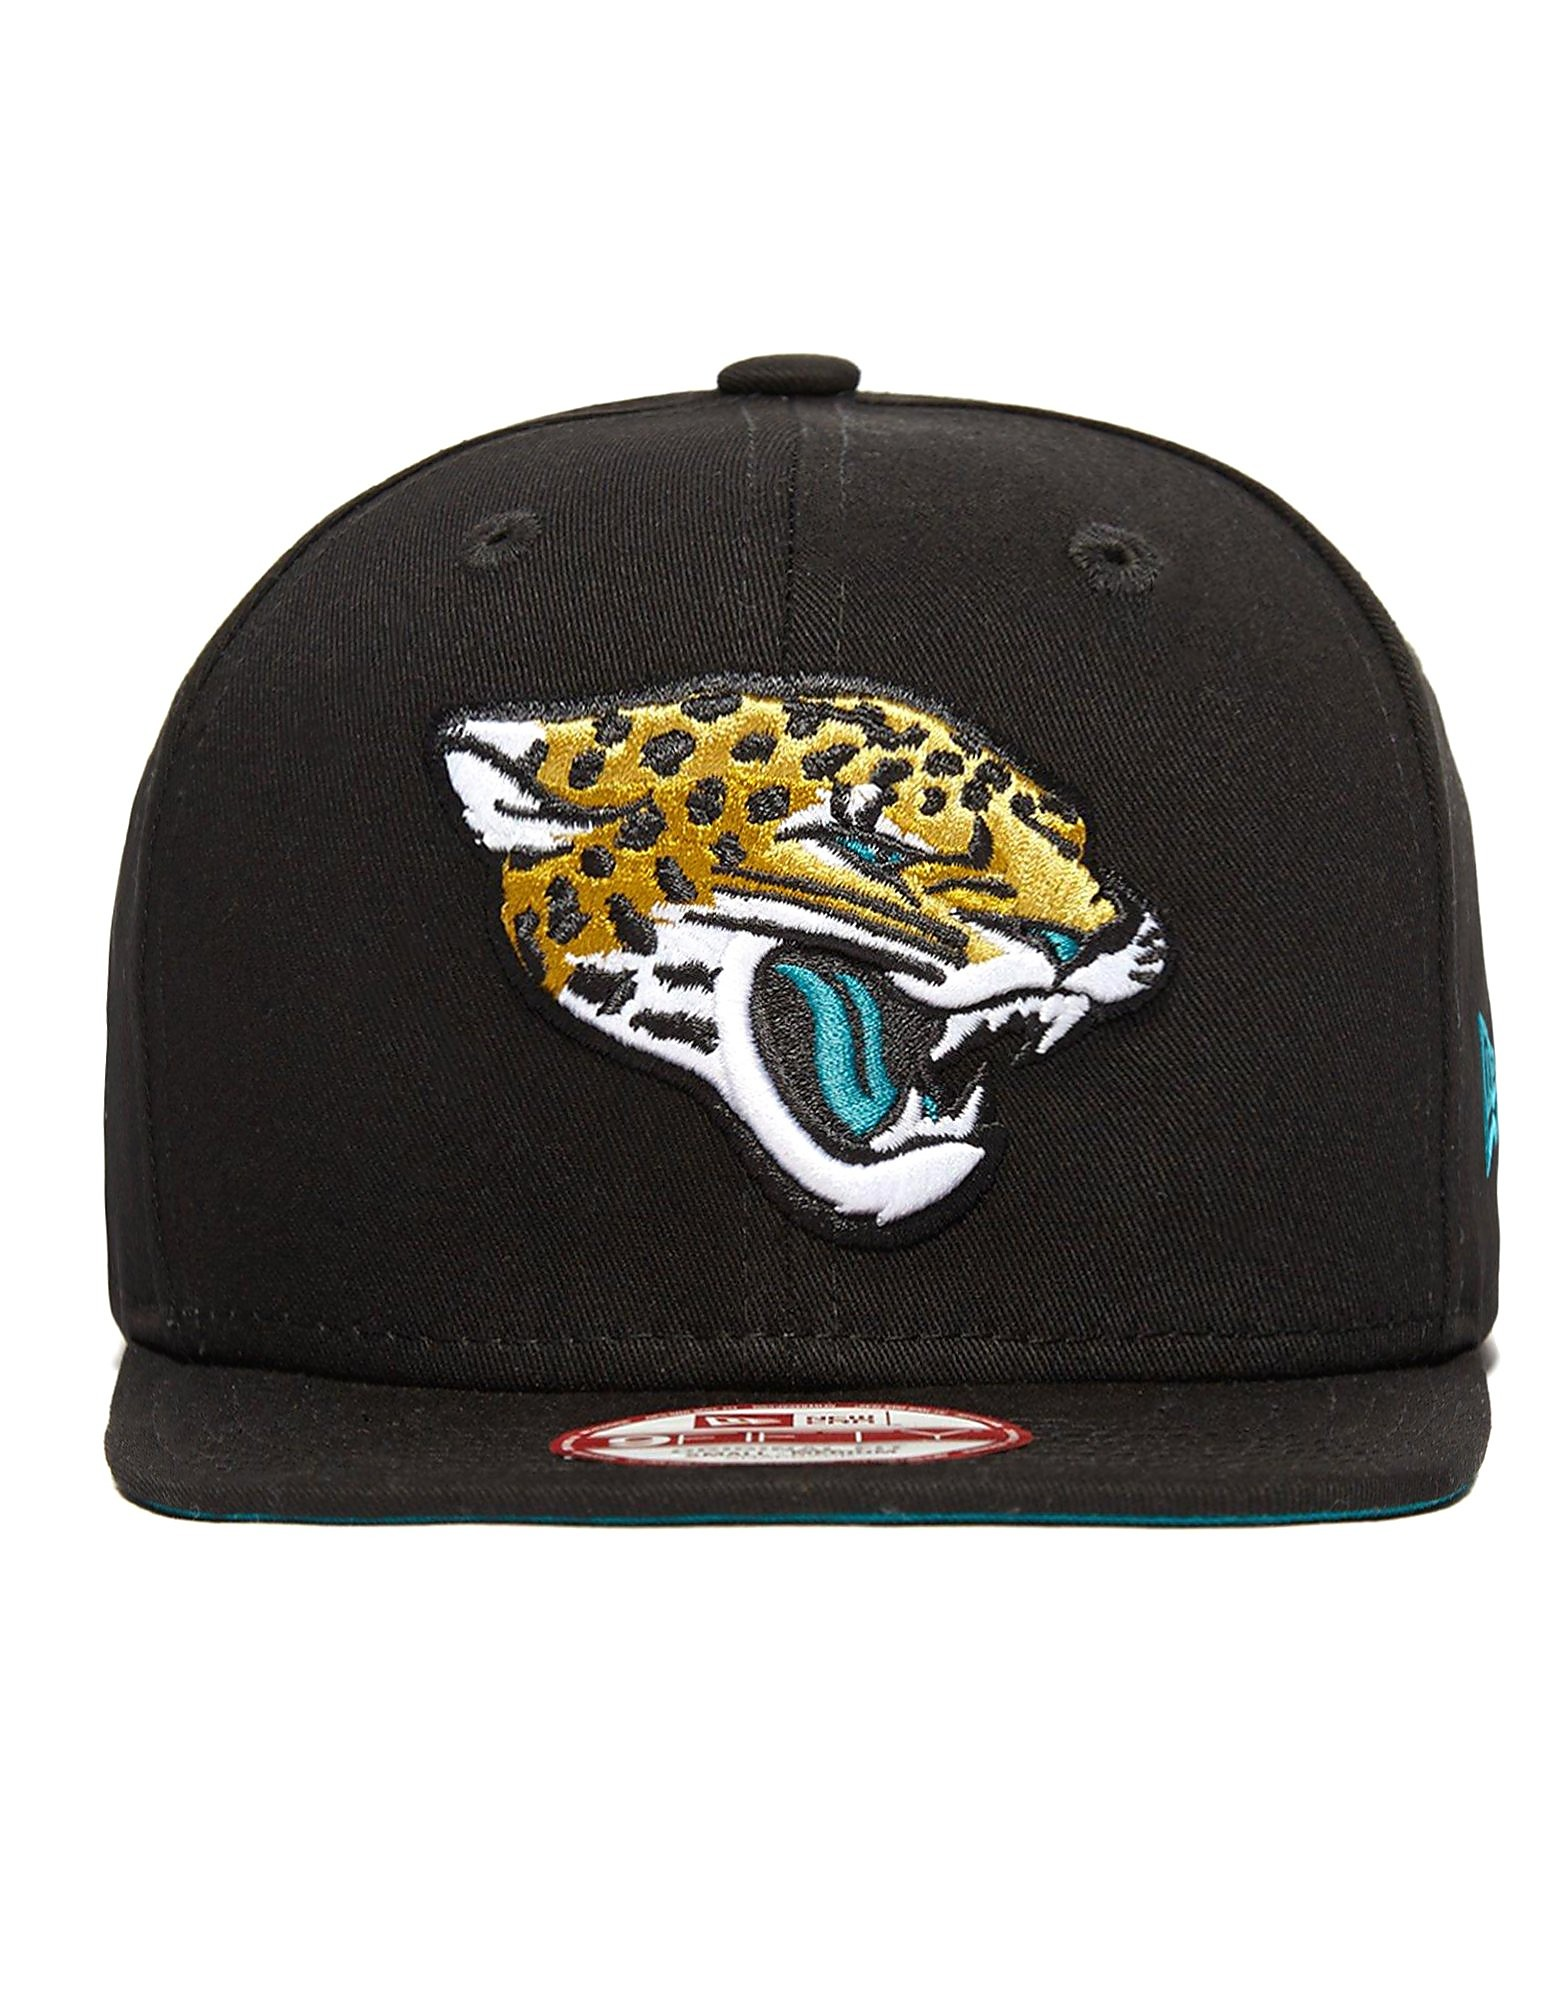 New Era 9FIFTY NFL Jacksonville Jaguars Snapback Cap